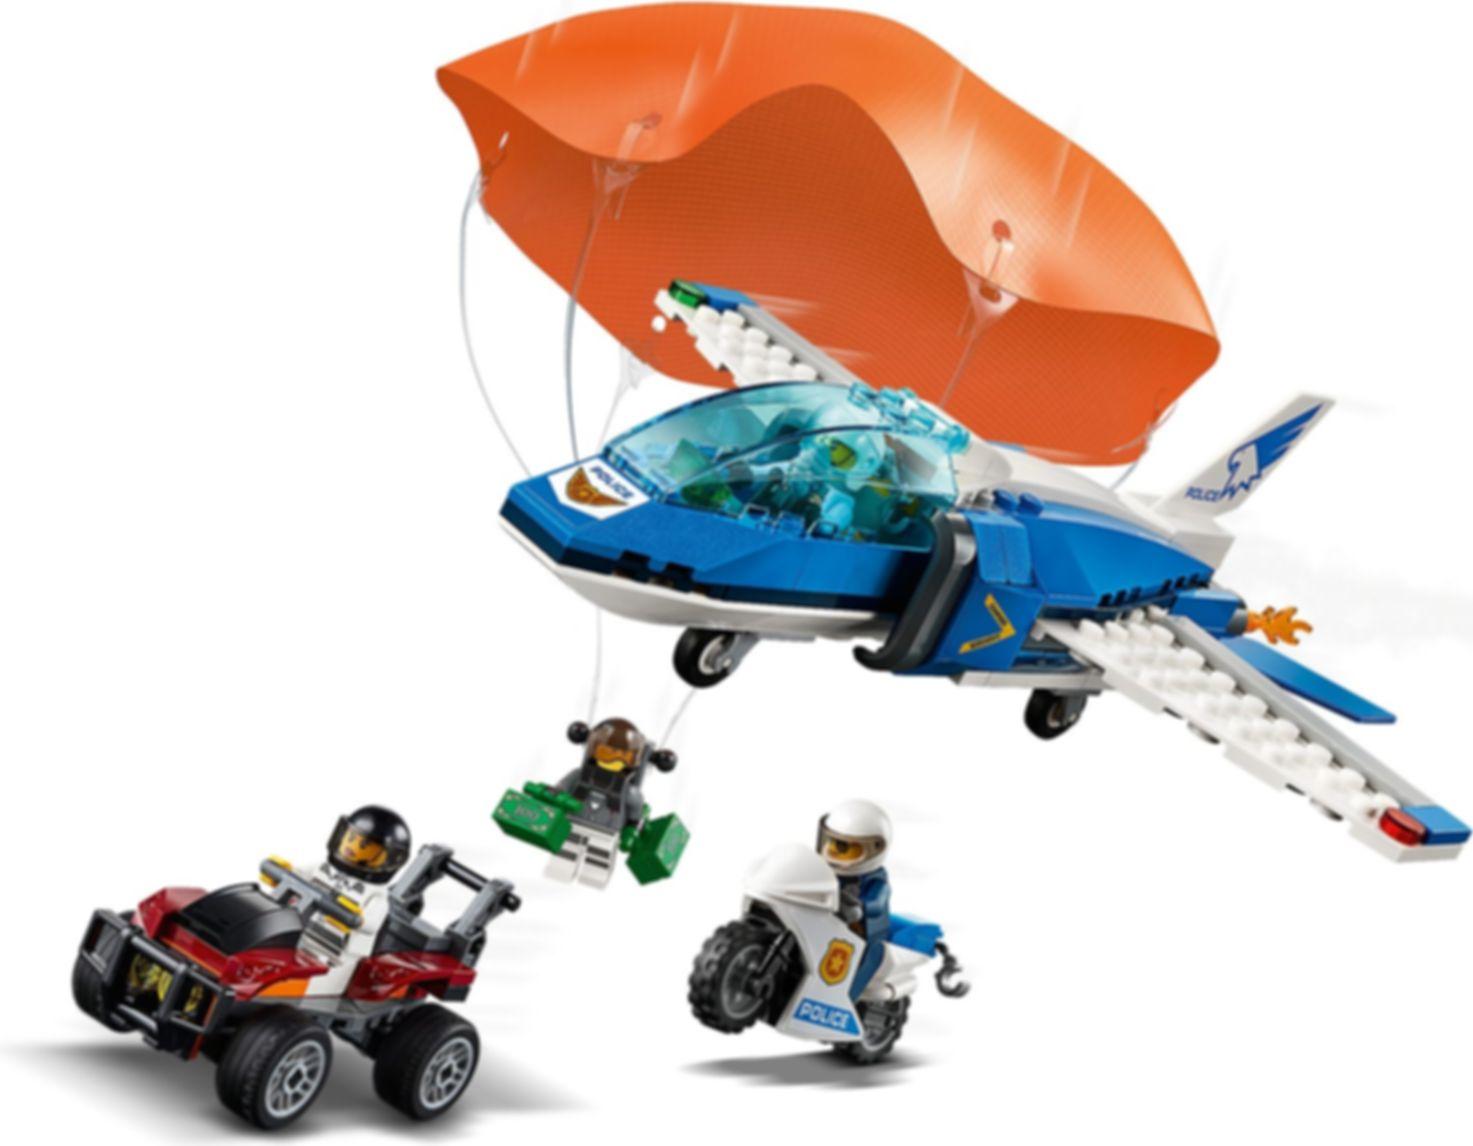 Sky Police Parachute Arrest gameplay